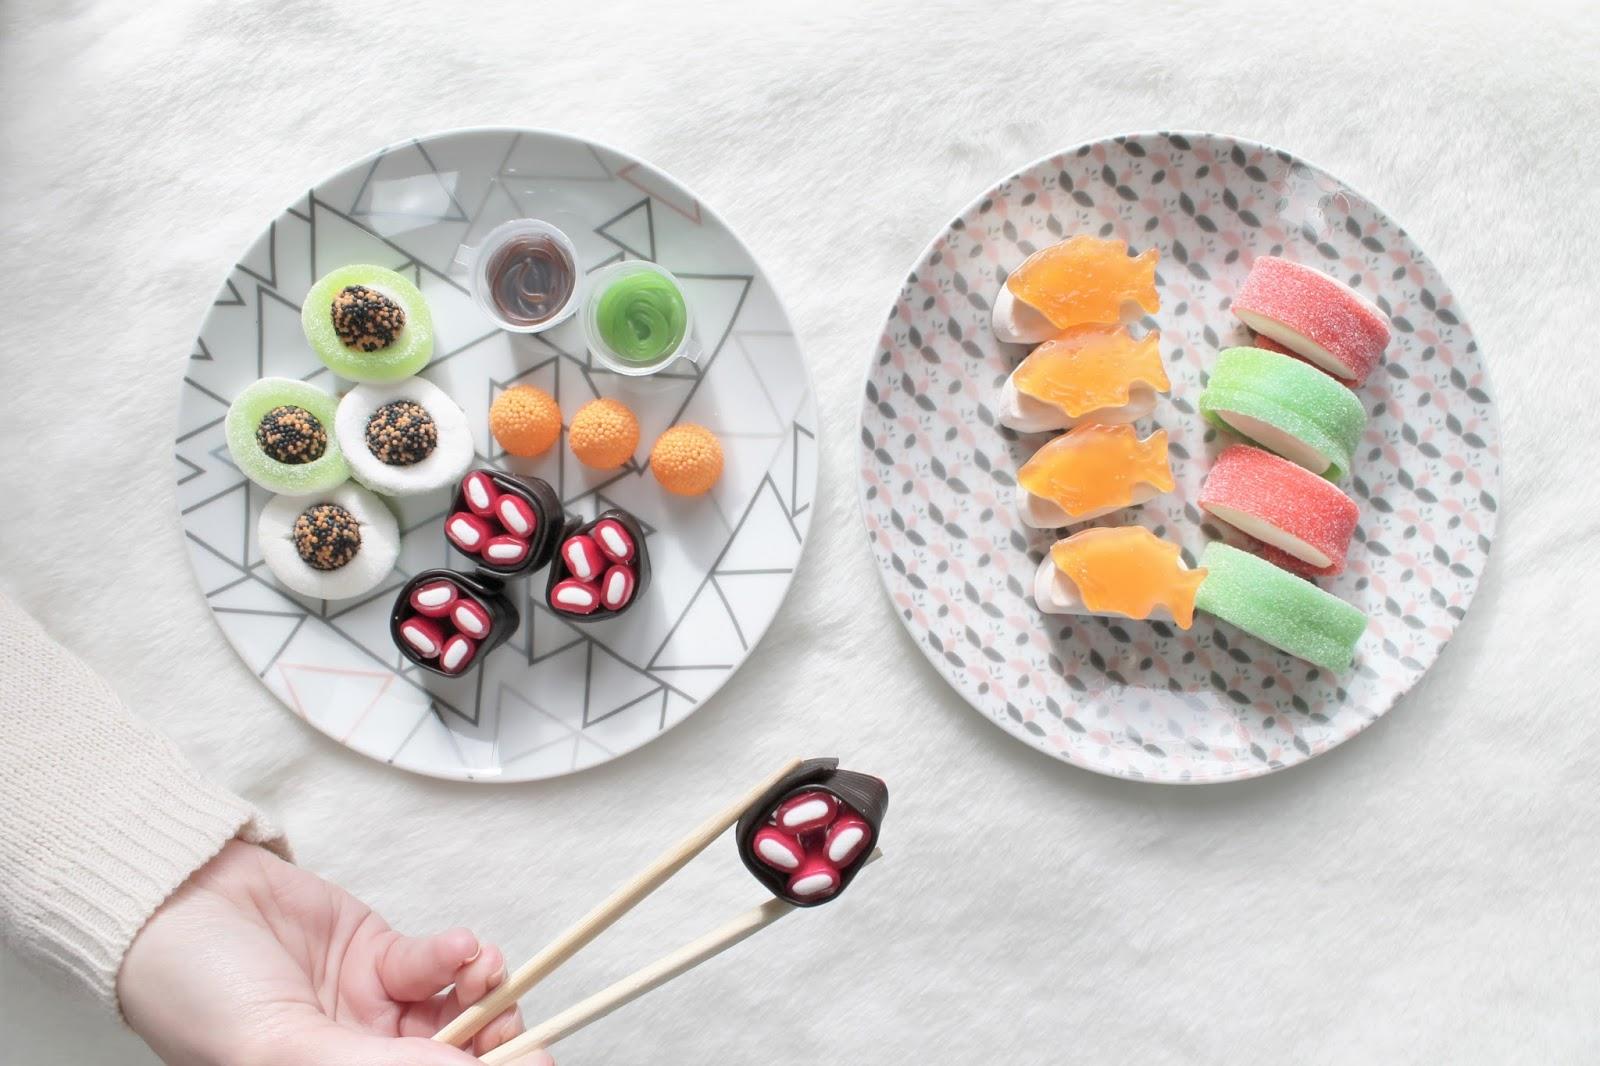 degustabox box food fevrier 2016 code promo bon plan reduc parrainage offert parrain sushi look o look